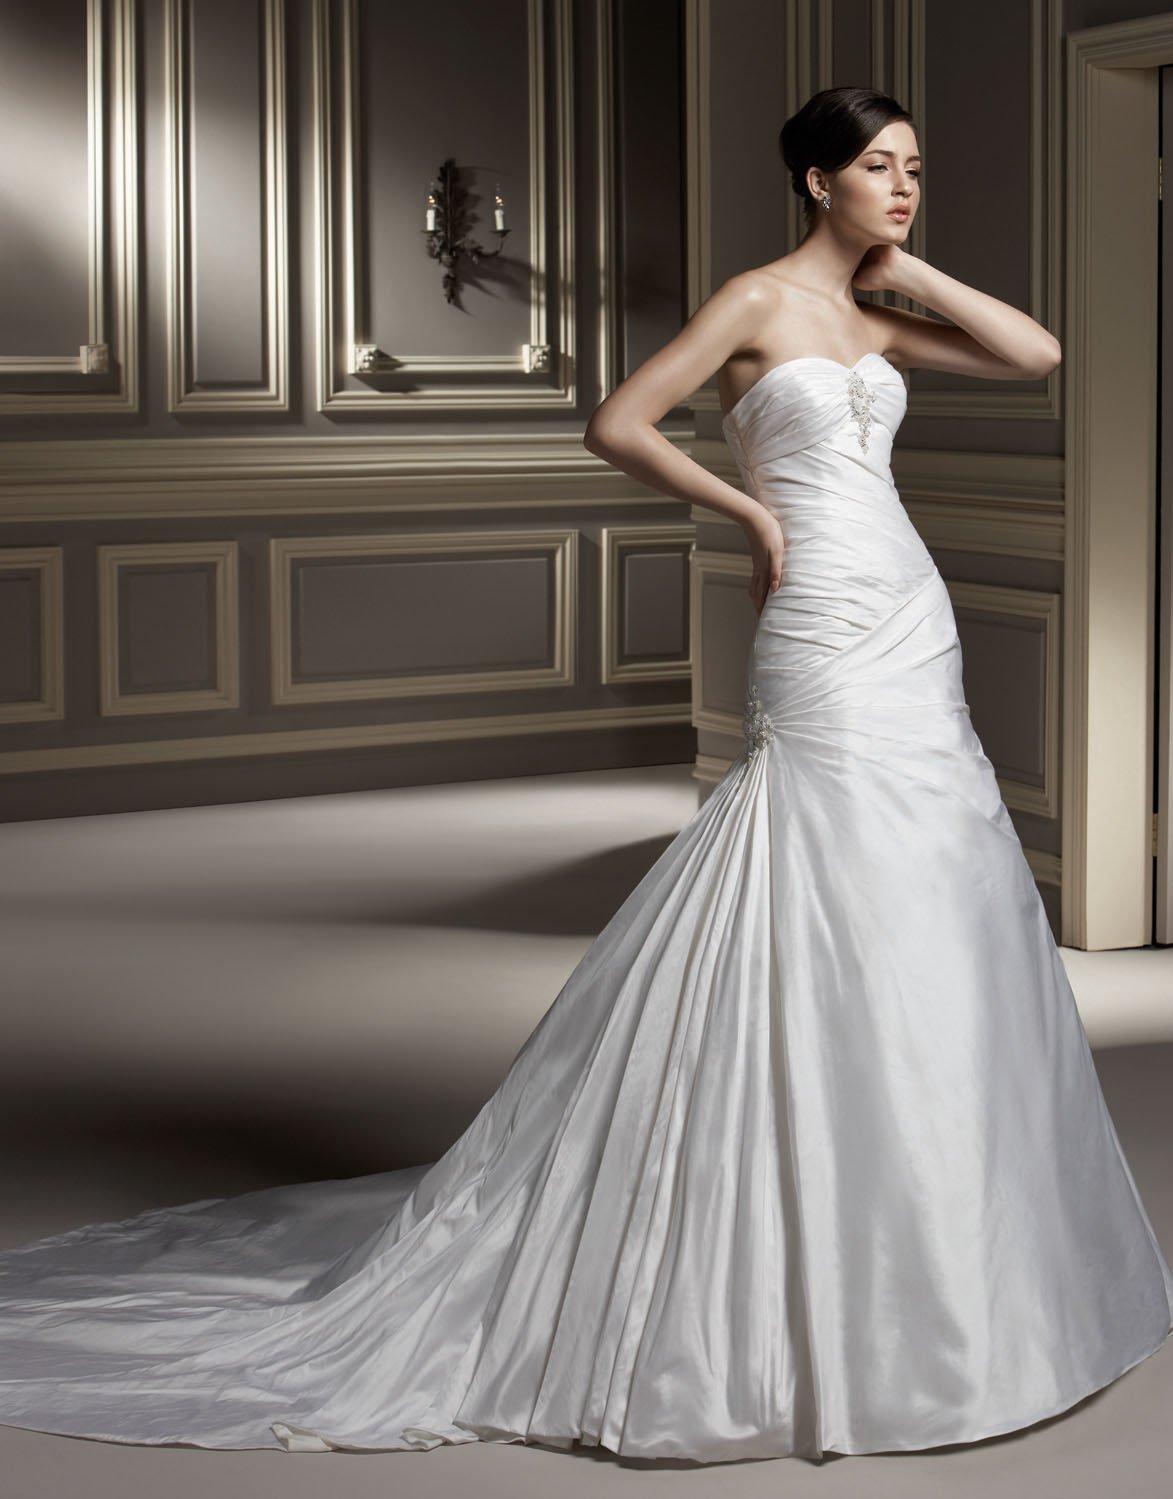 Sweetheart Strapless Beaded Train Taffeta Wedding Dress Bridal Gown aq0033